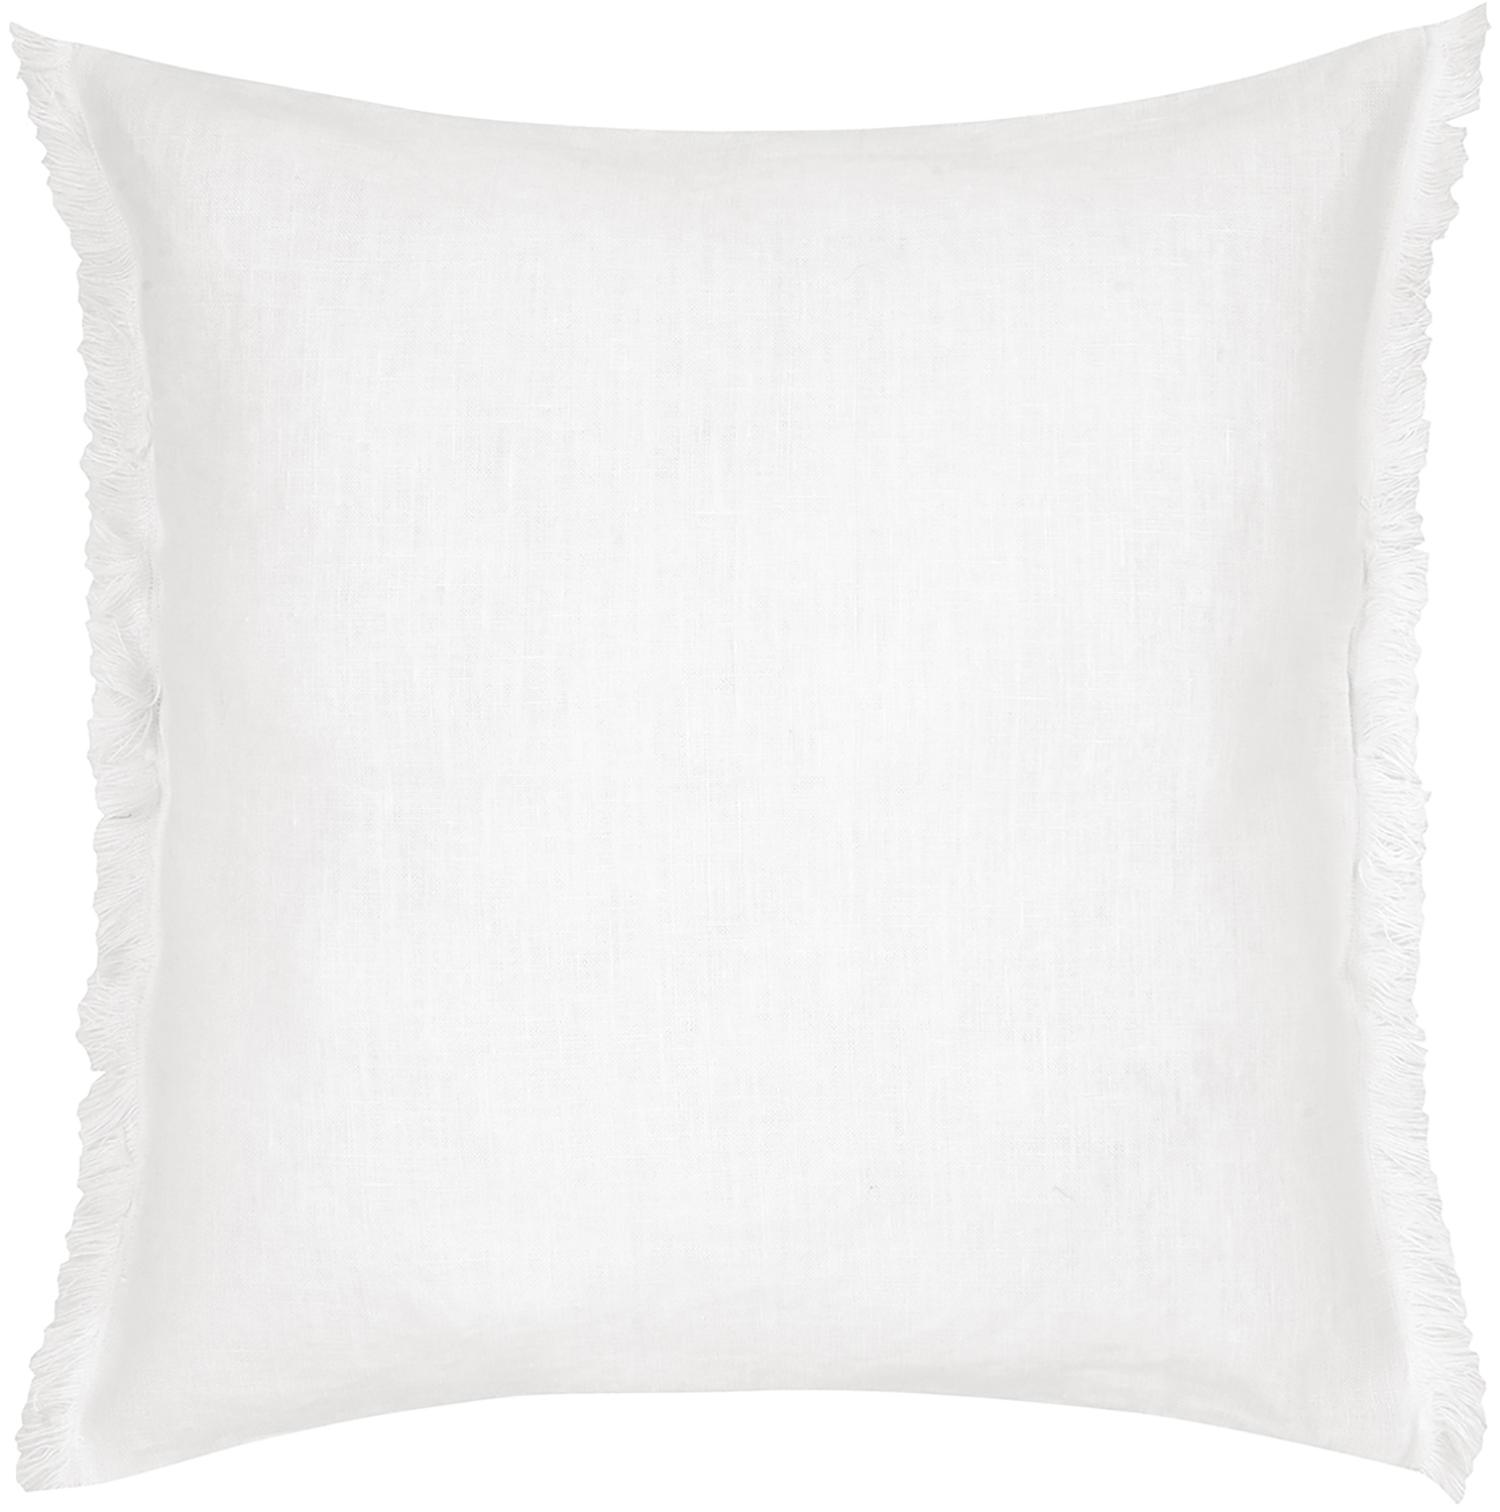 Funda de cojín de lino con flecos Luana, Lino, Blanco crema, An 40 x L 40 cm